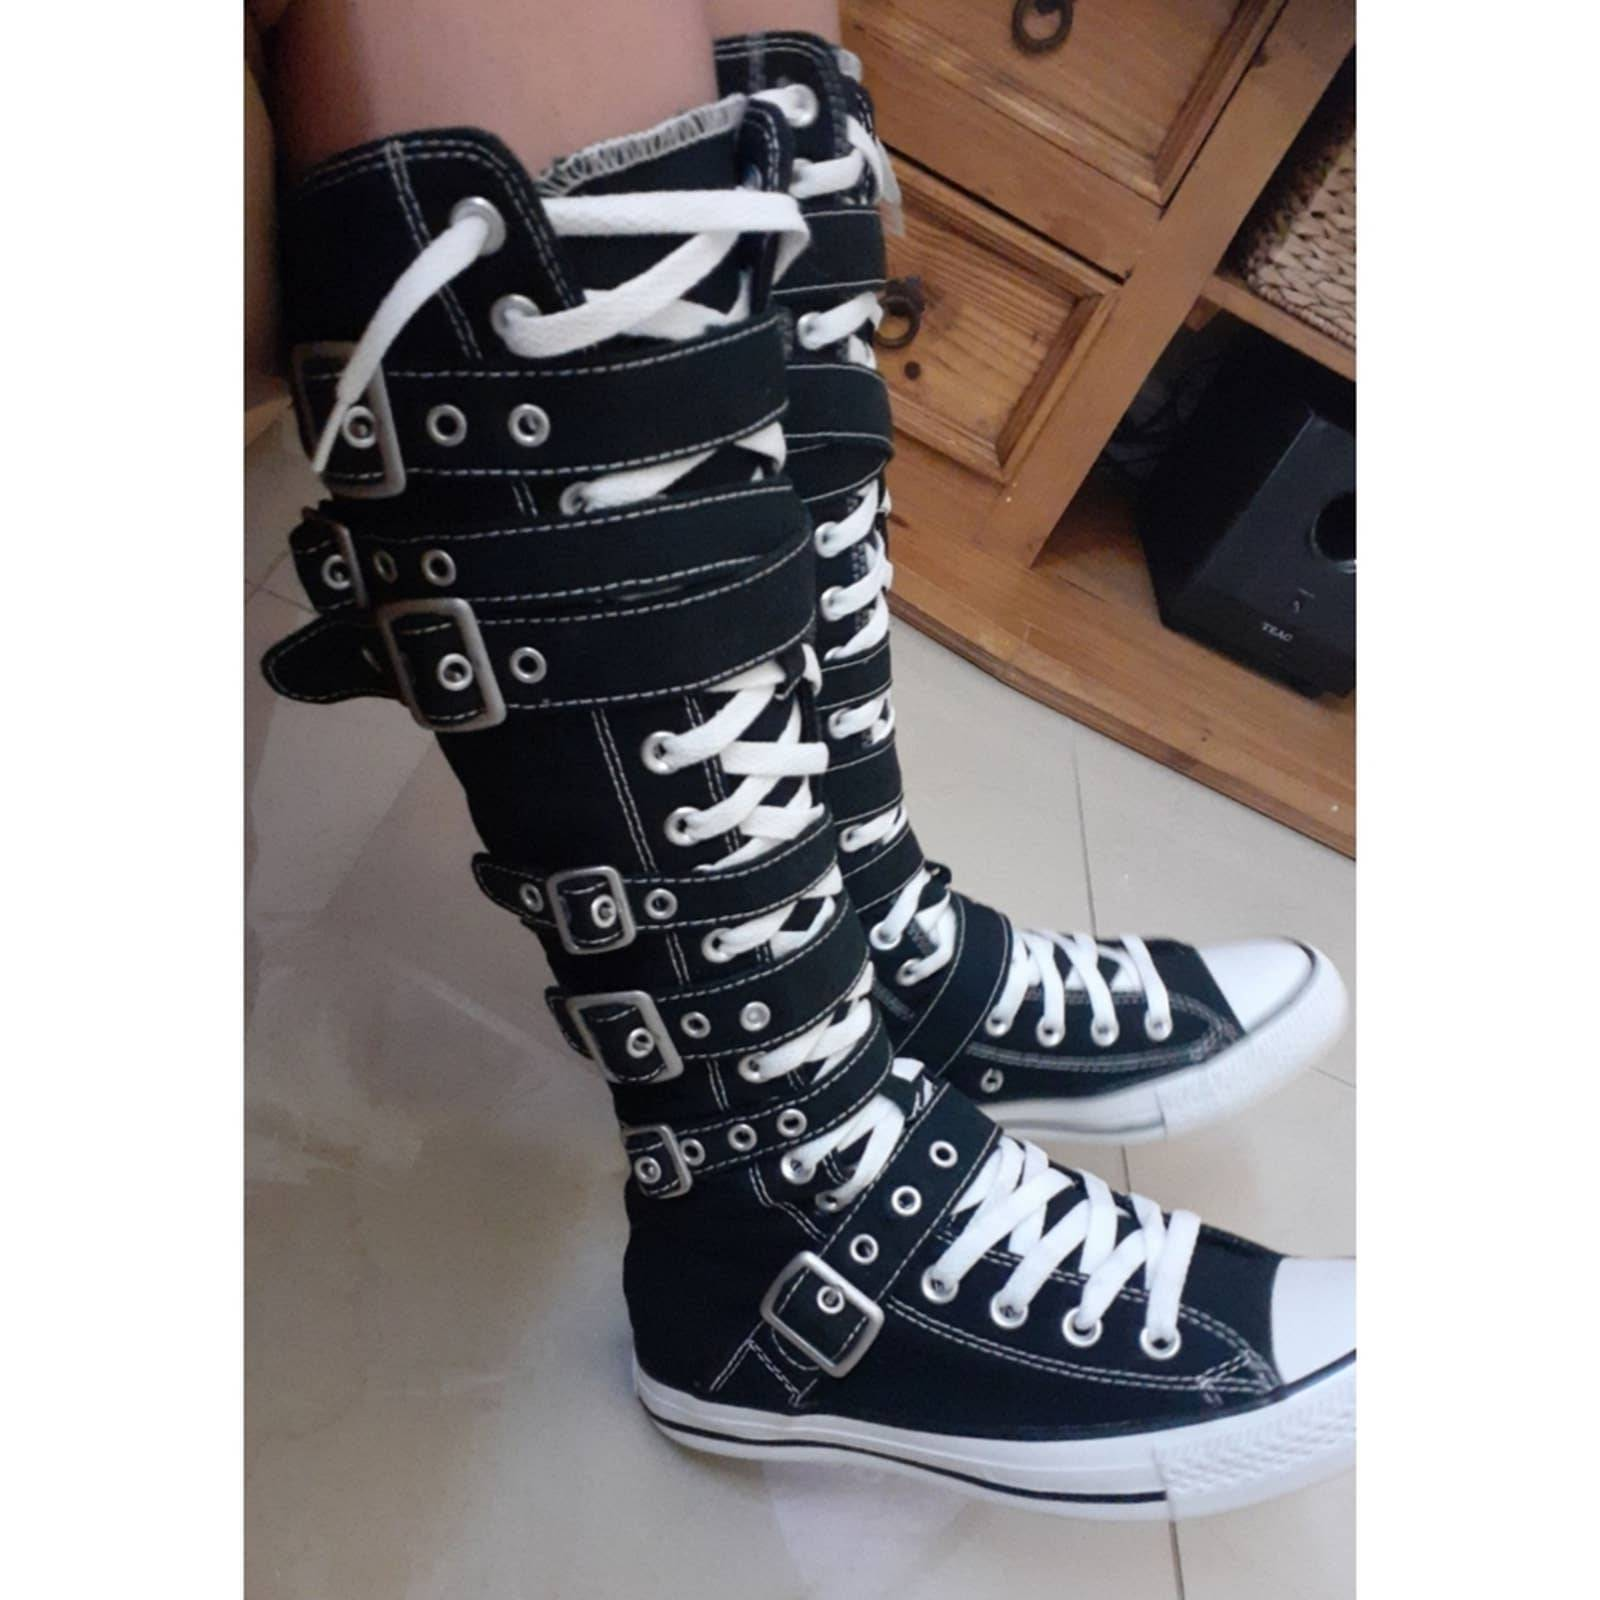 Converse Buckle Strap Shoes | Mercari